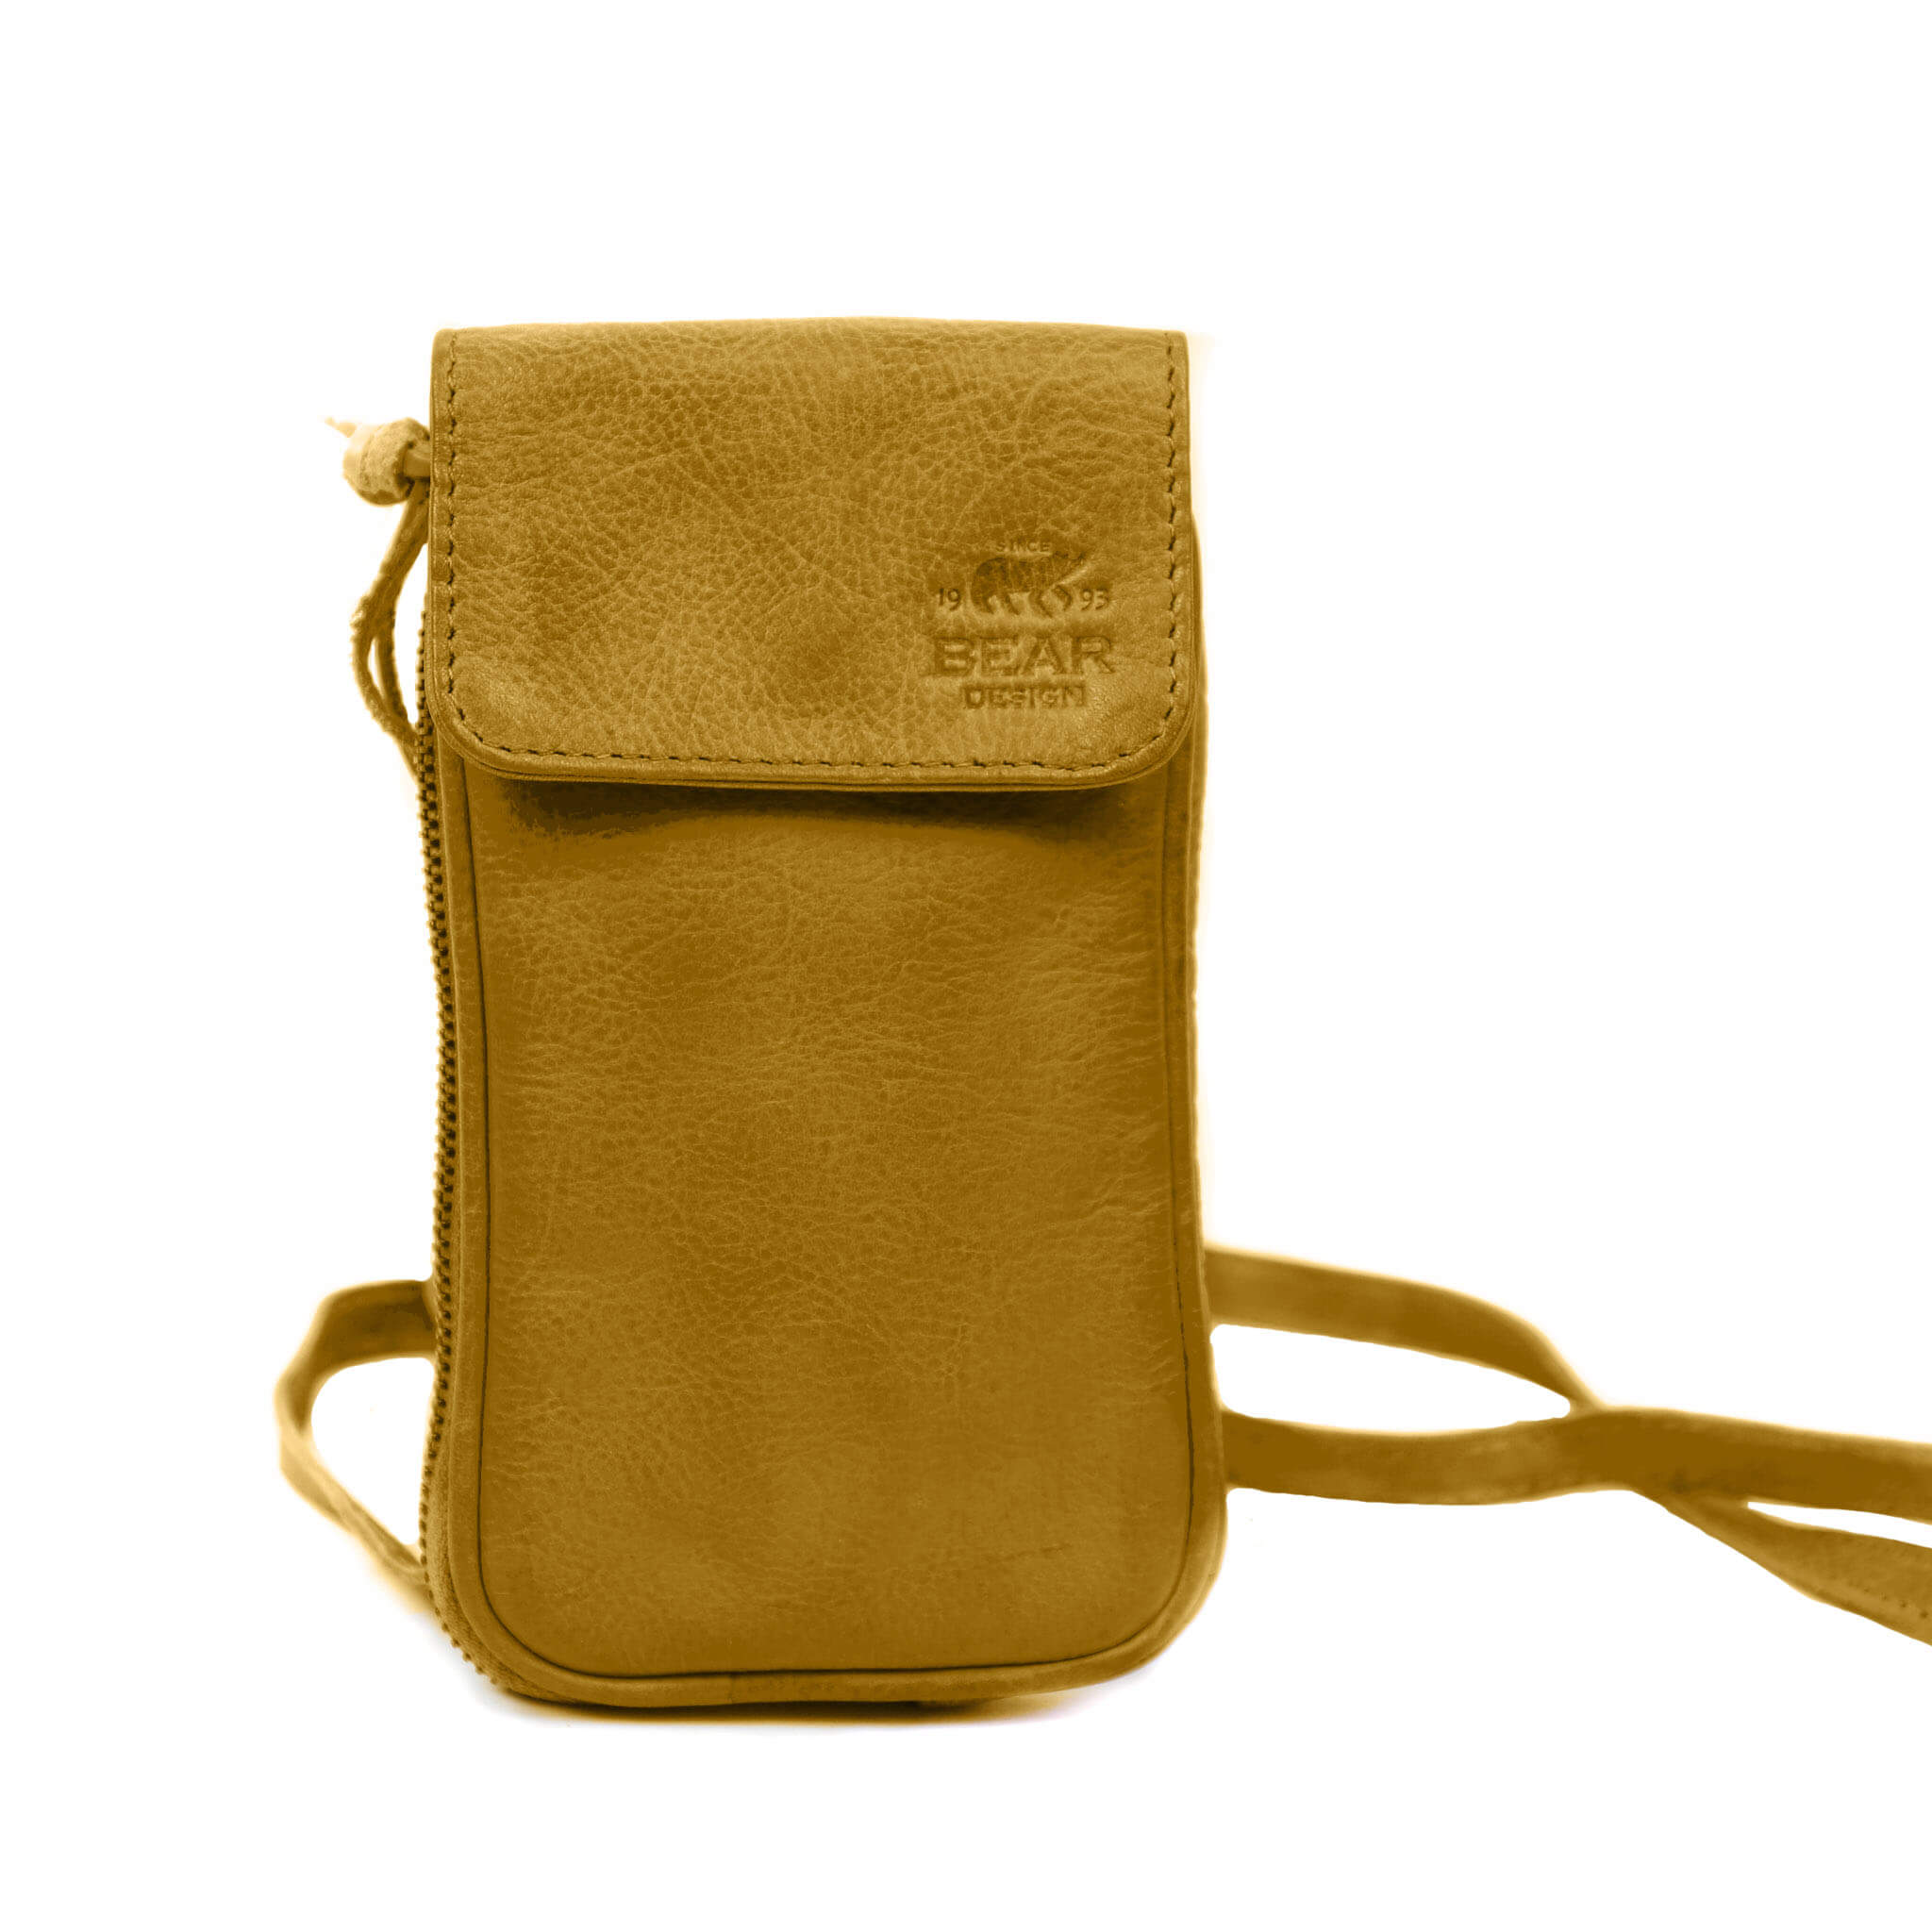 Bear Design Phone Bag Ahana Telefoontasje Geel